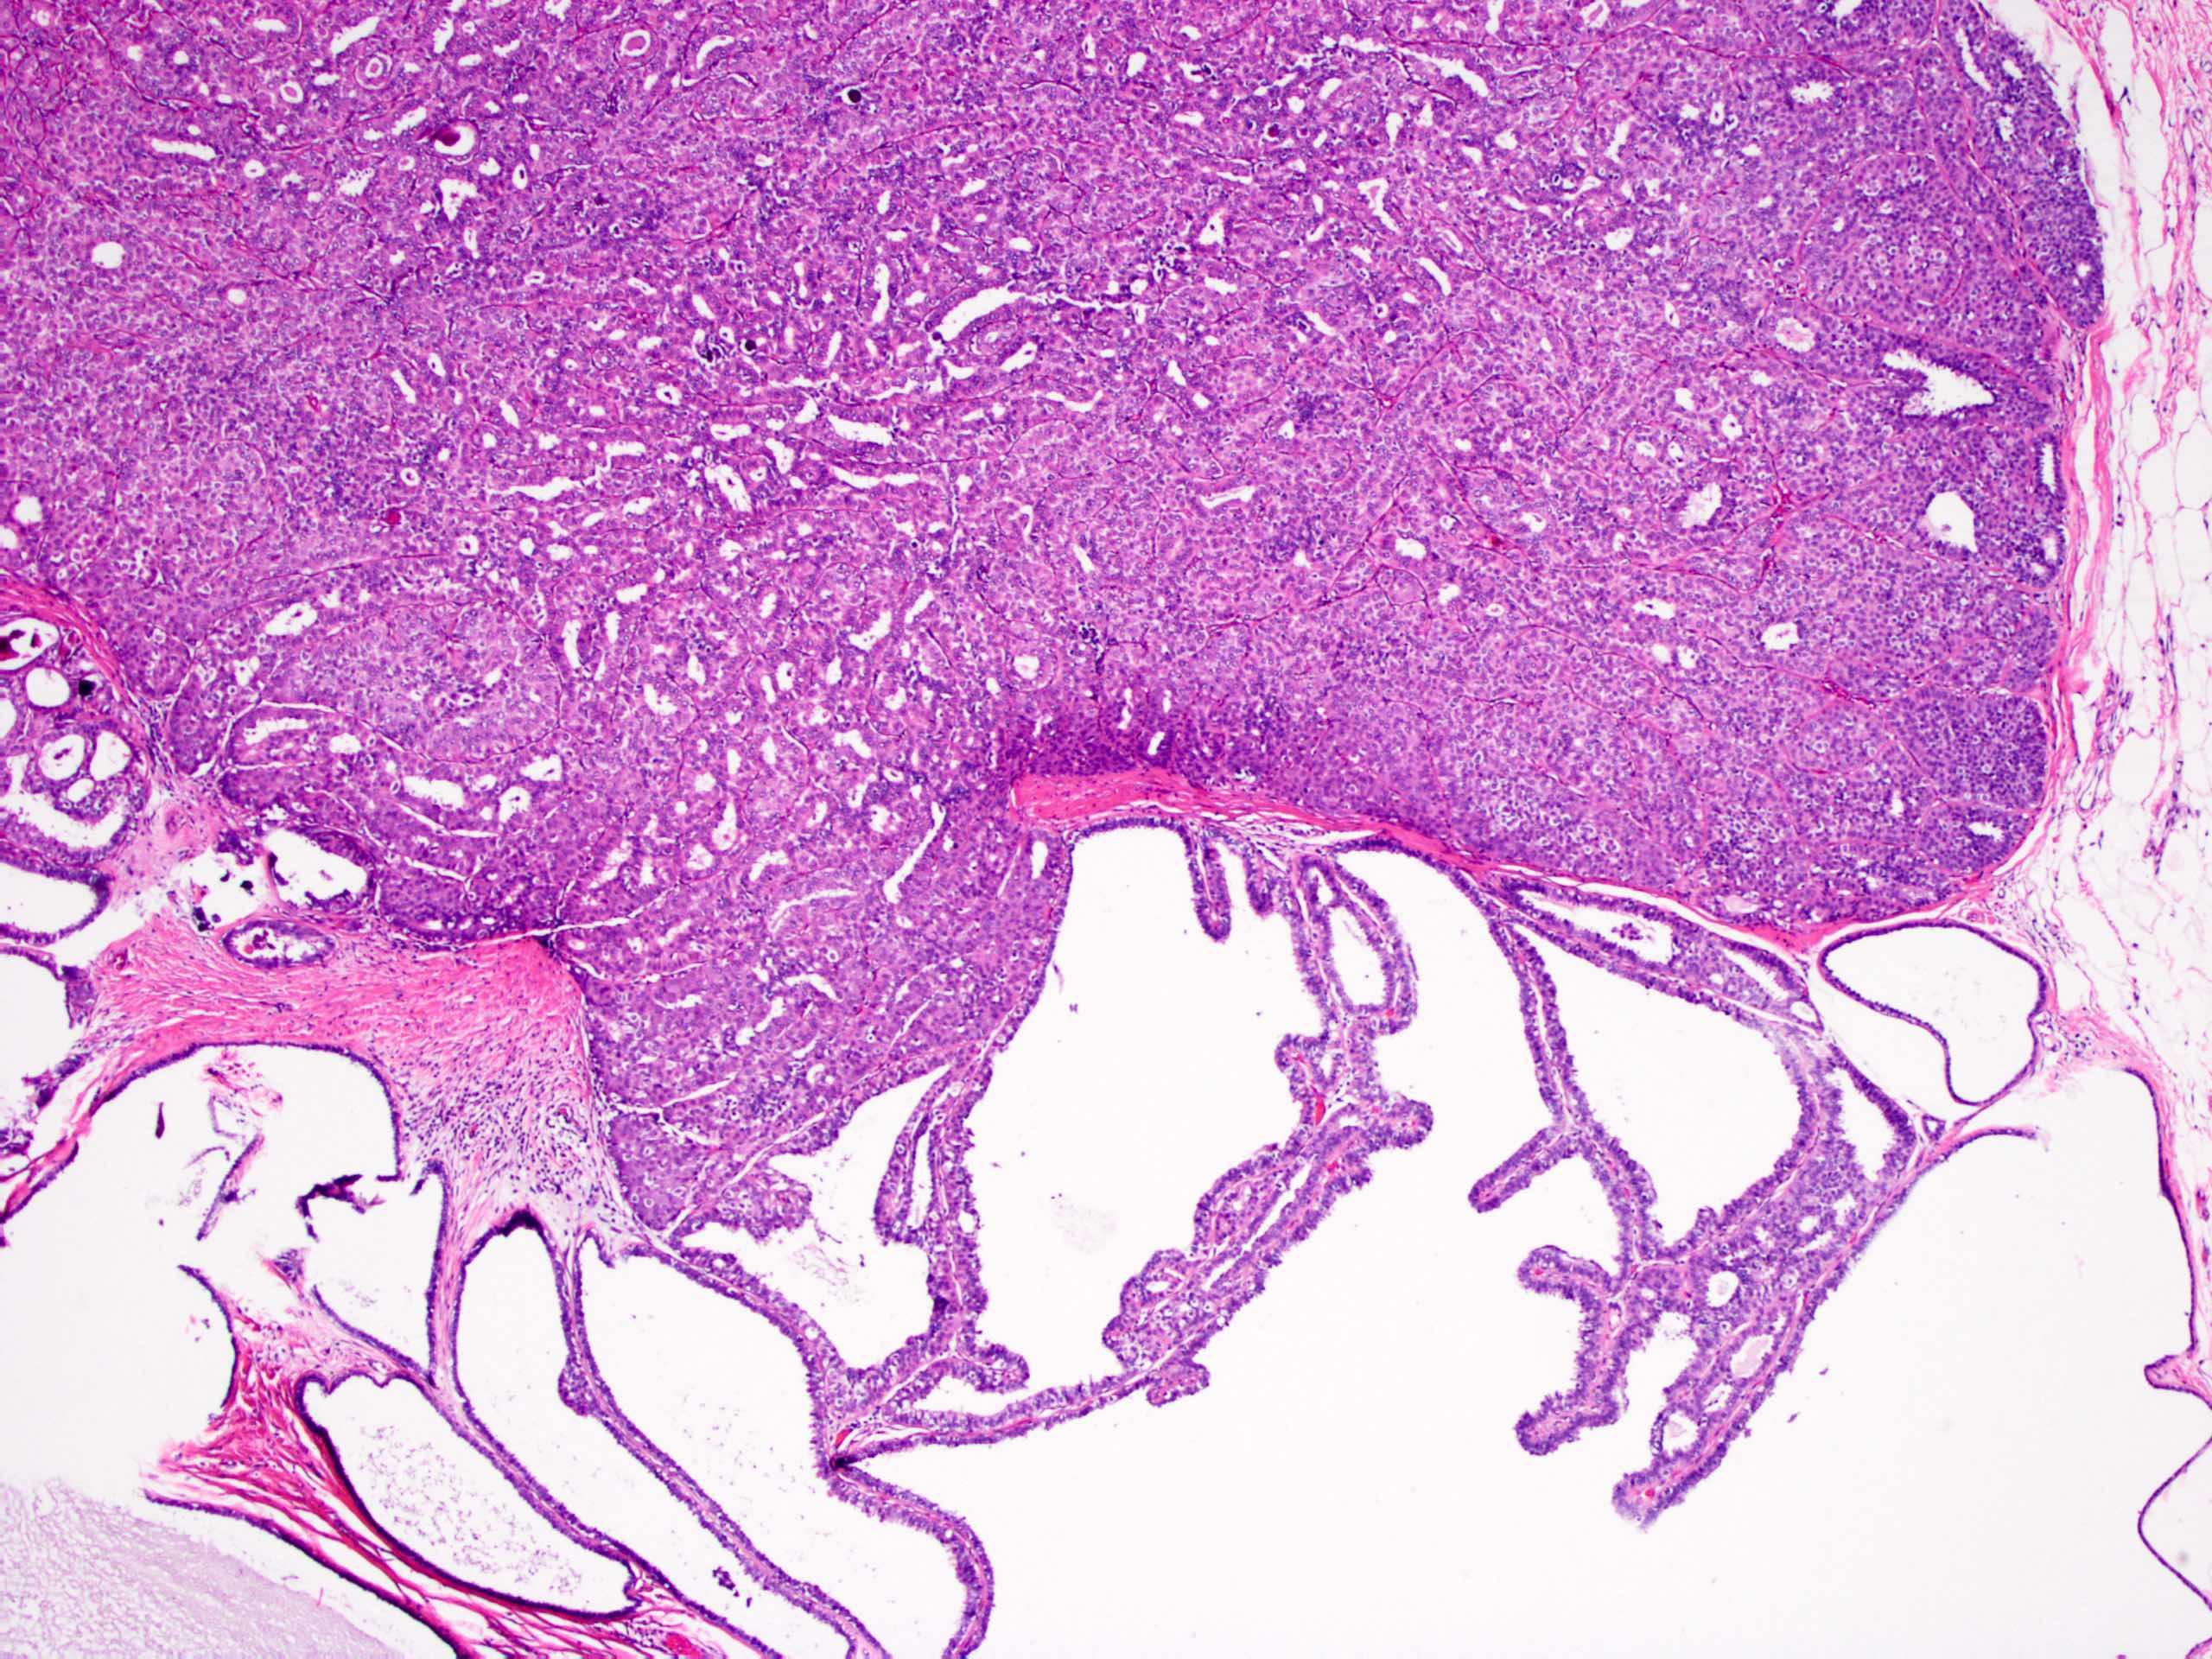 Papiloma intraductal de mama - Papiloma intraductal histologia - Papiloma ductal atipico